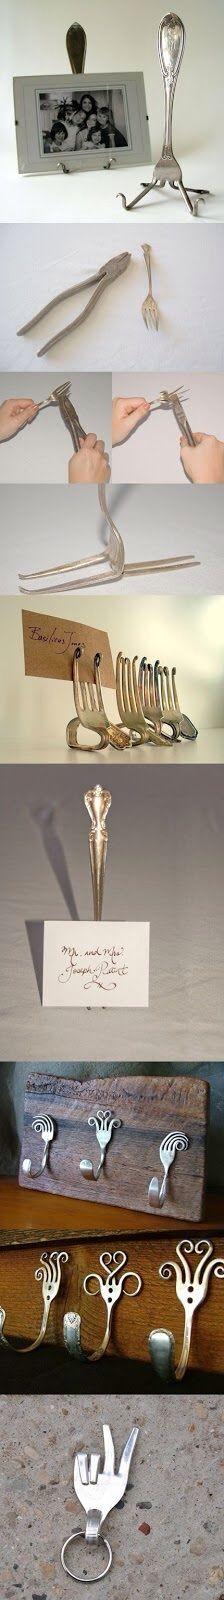 Cutlery craft